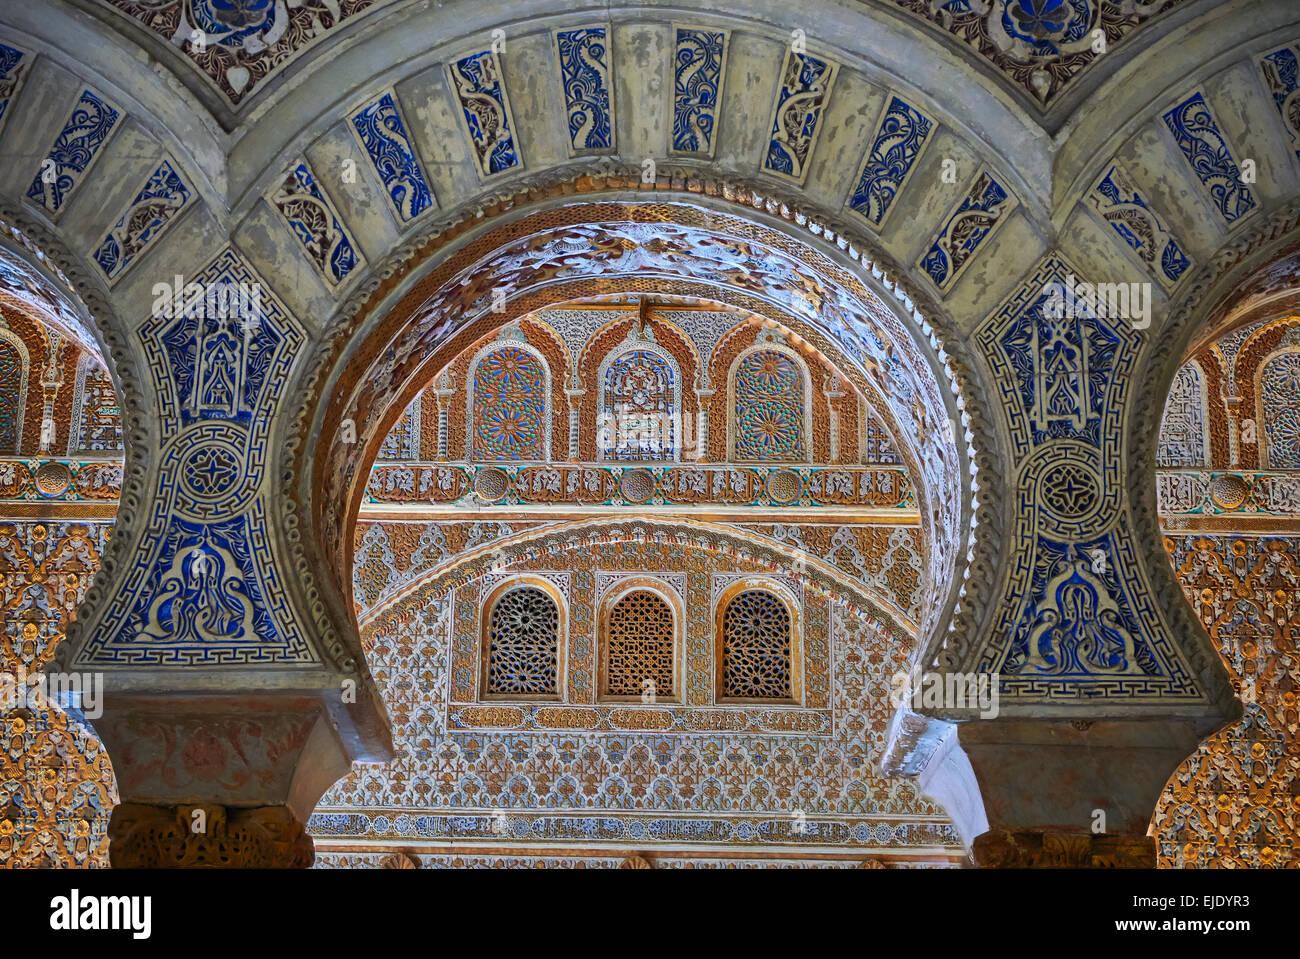 Mudjar Arabesque gypseries du 12ème siècle Salón de Embajadores (ambassadeurs' Hall ). Alcazar Photo Stock